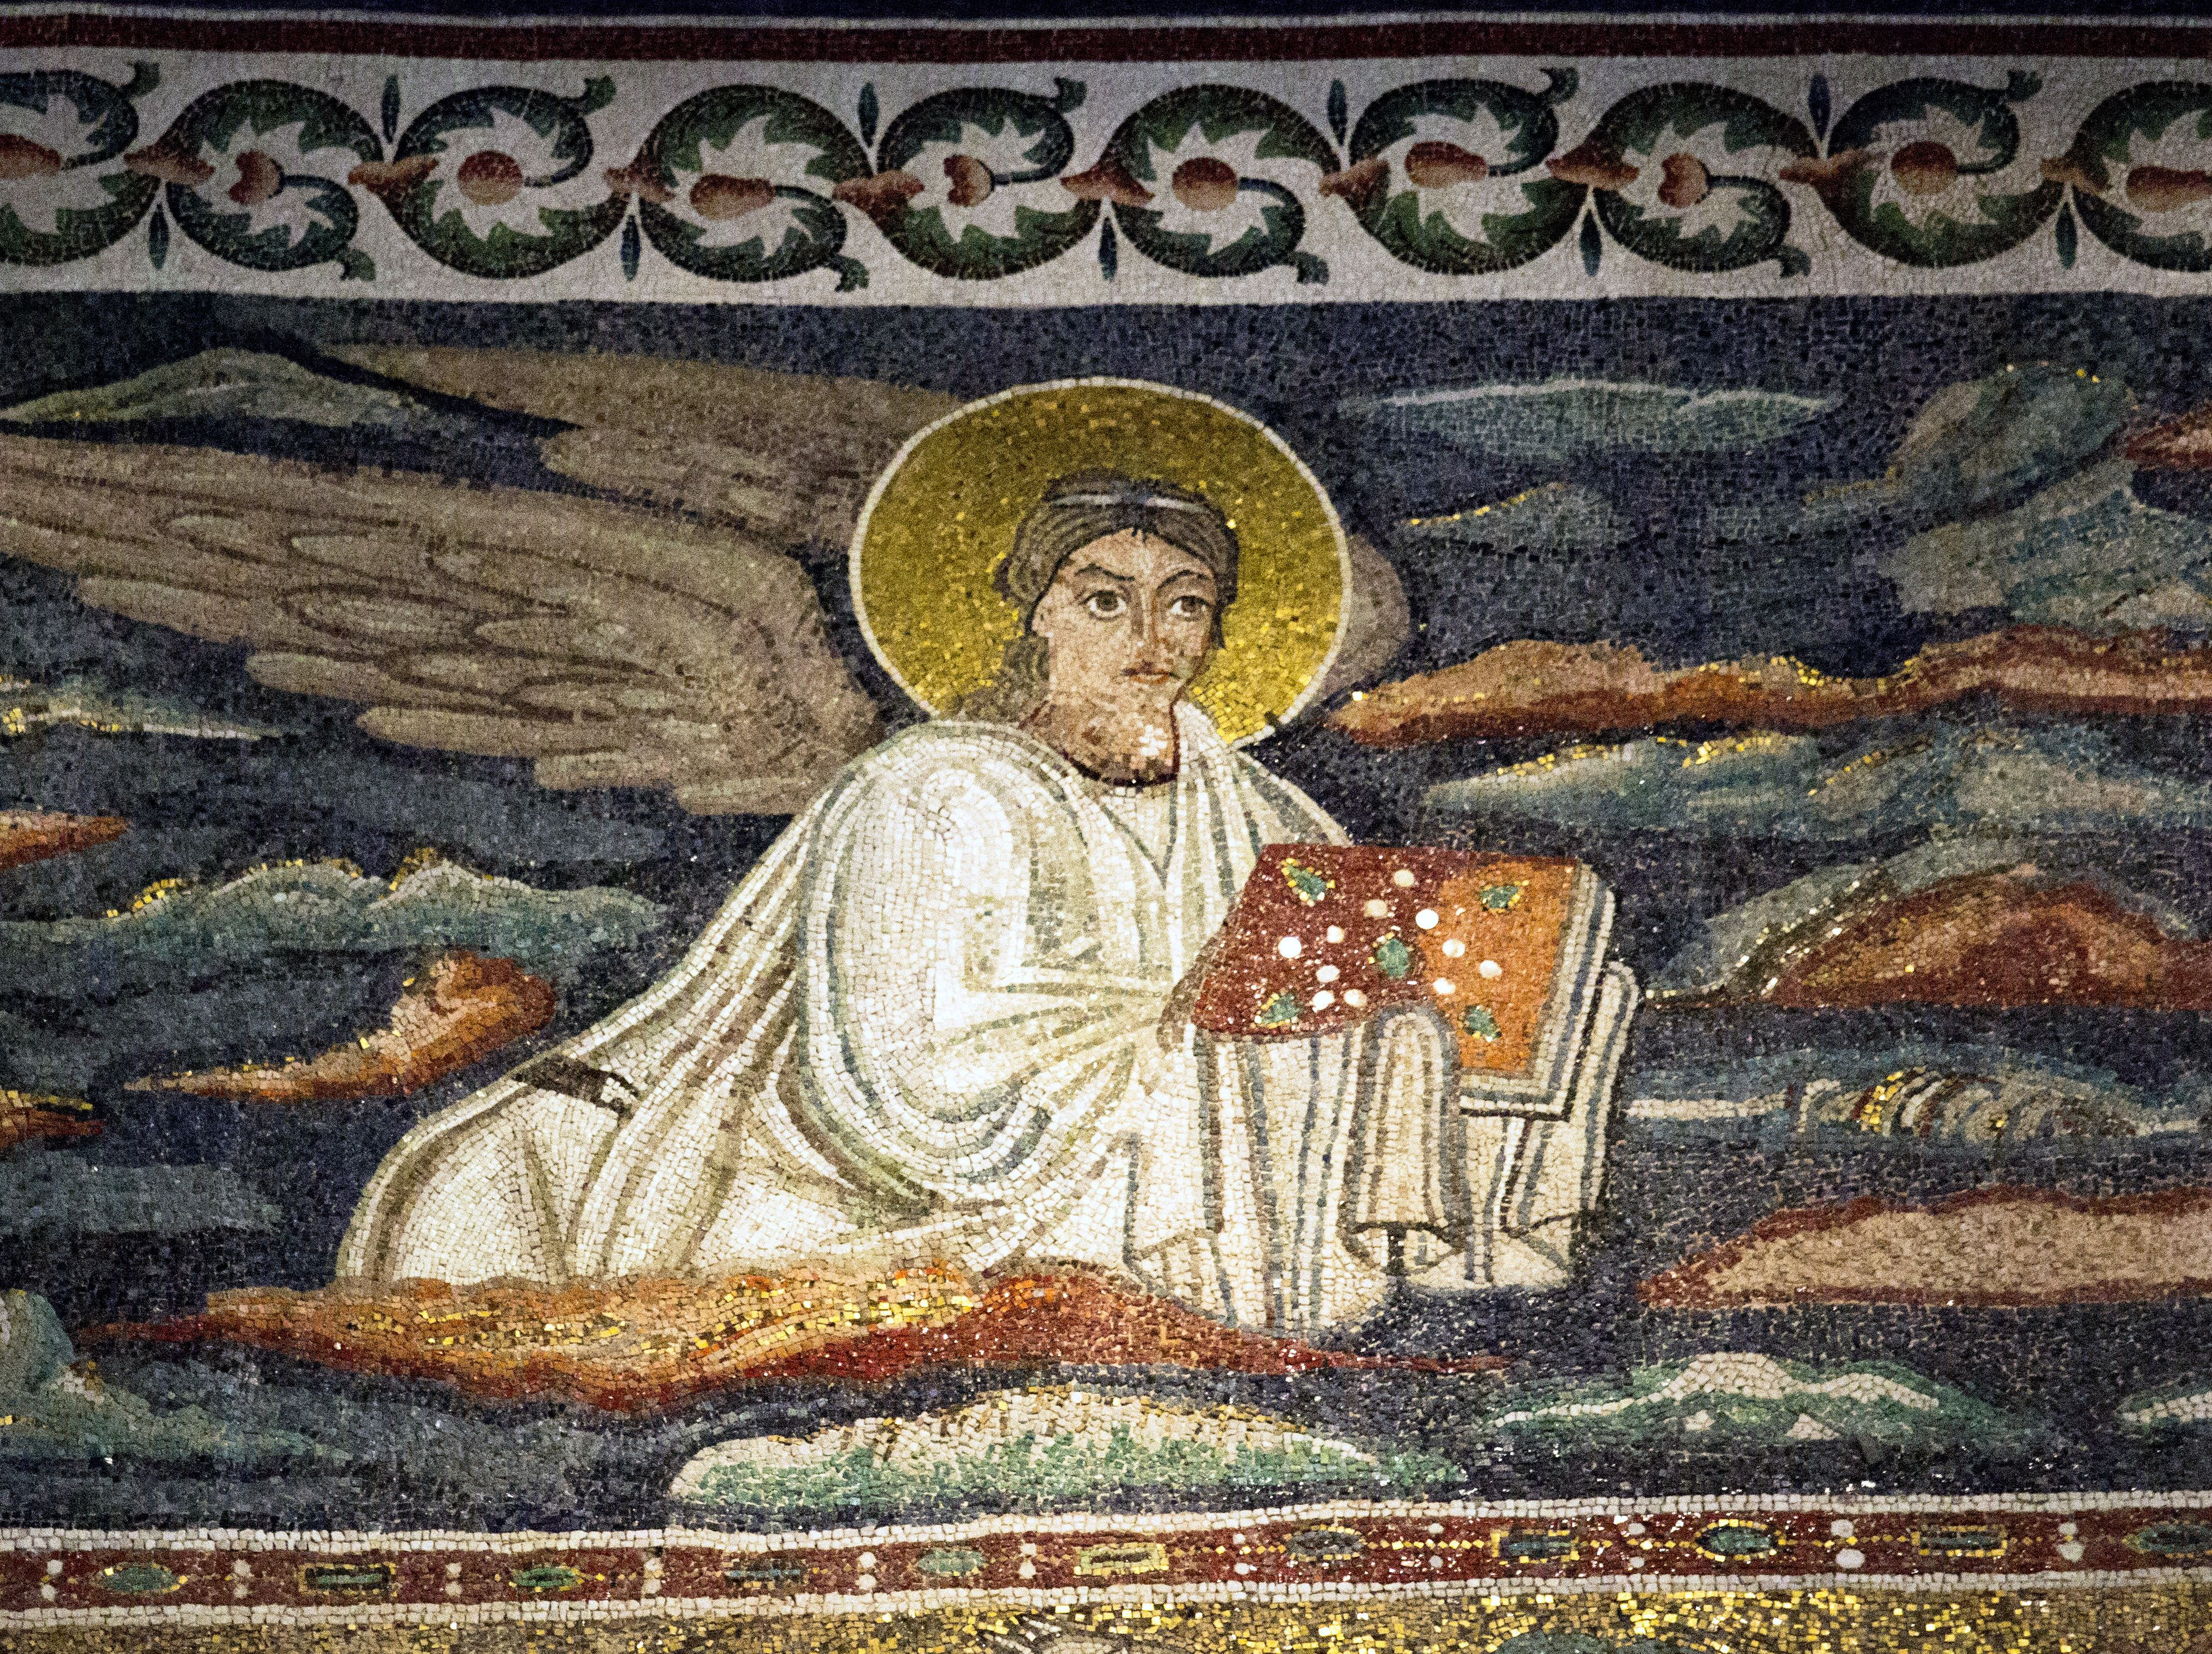 Basilica di santapollinare in classe il mosaico del registro mosaic winged man or angel symbol of matthew the evangelist apse biocorpaavc Choice Image